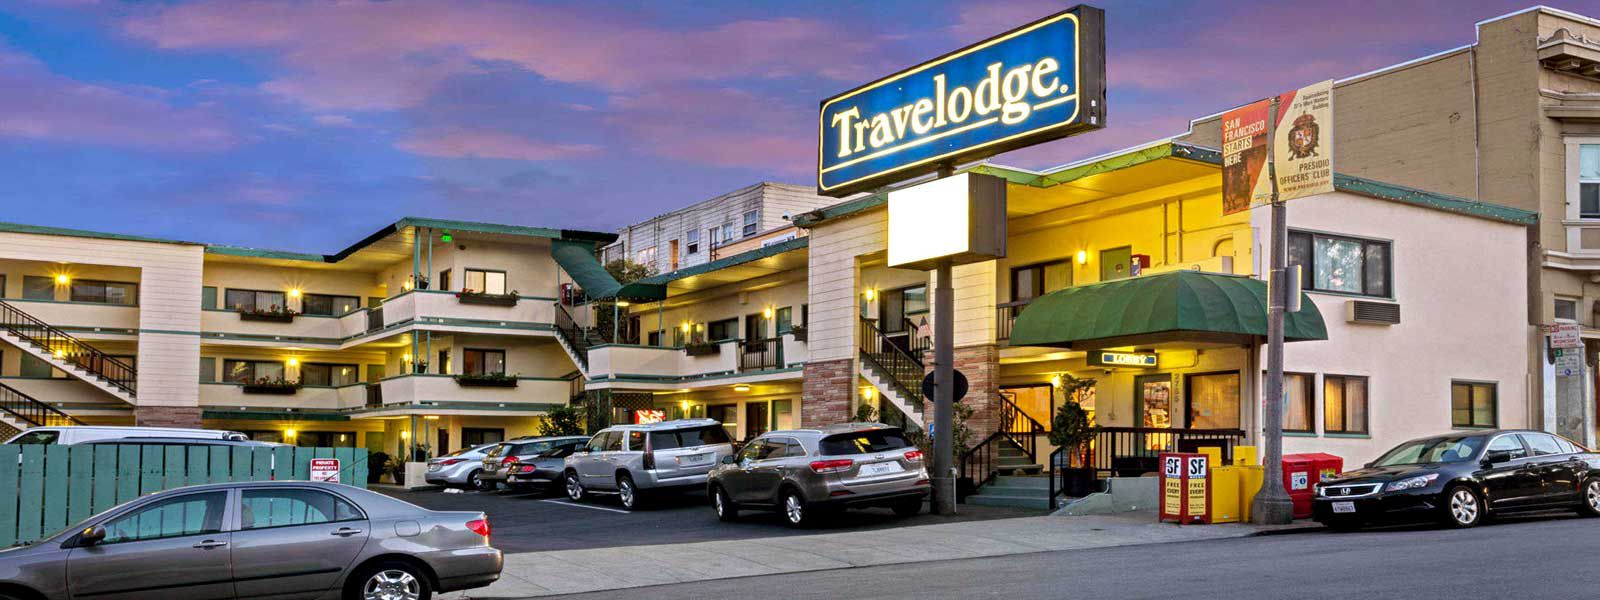 Travelodge Presidio